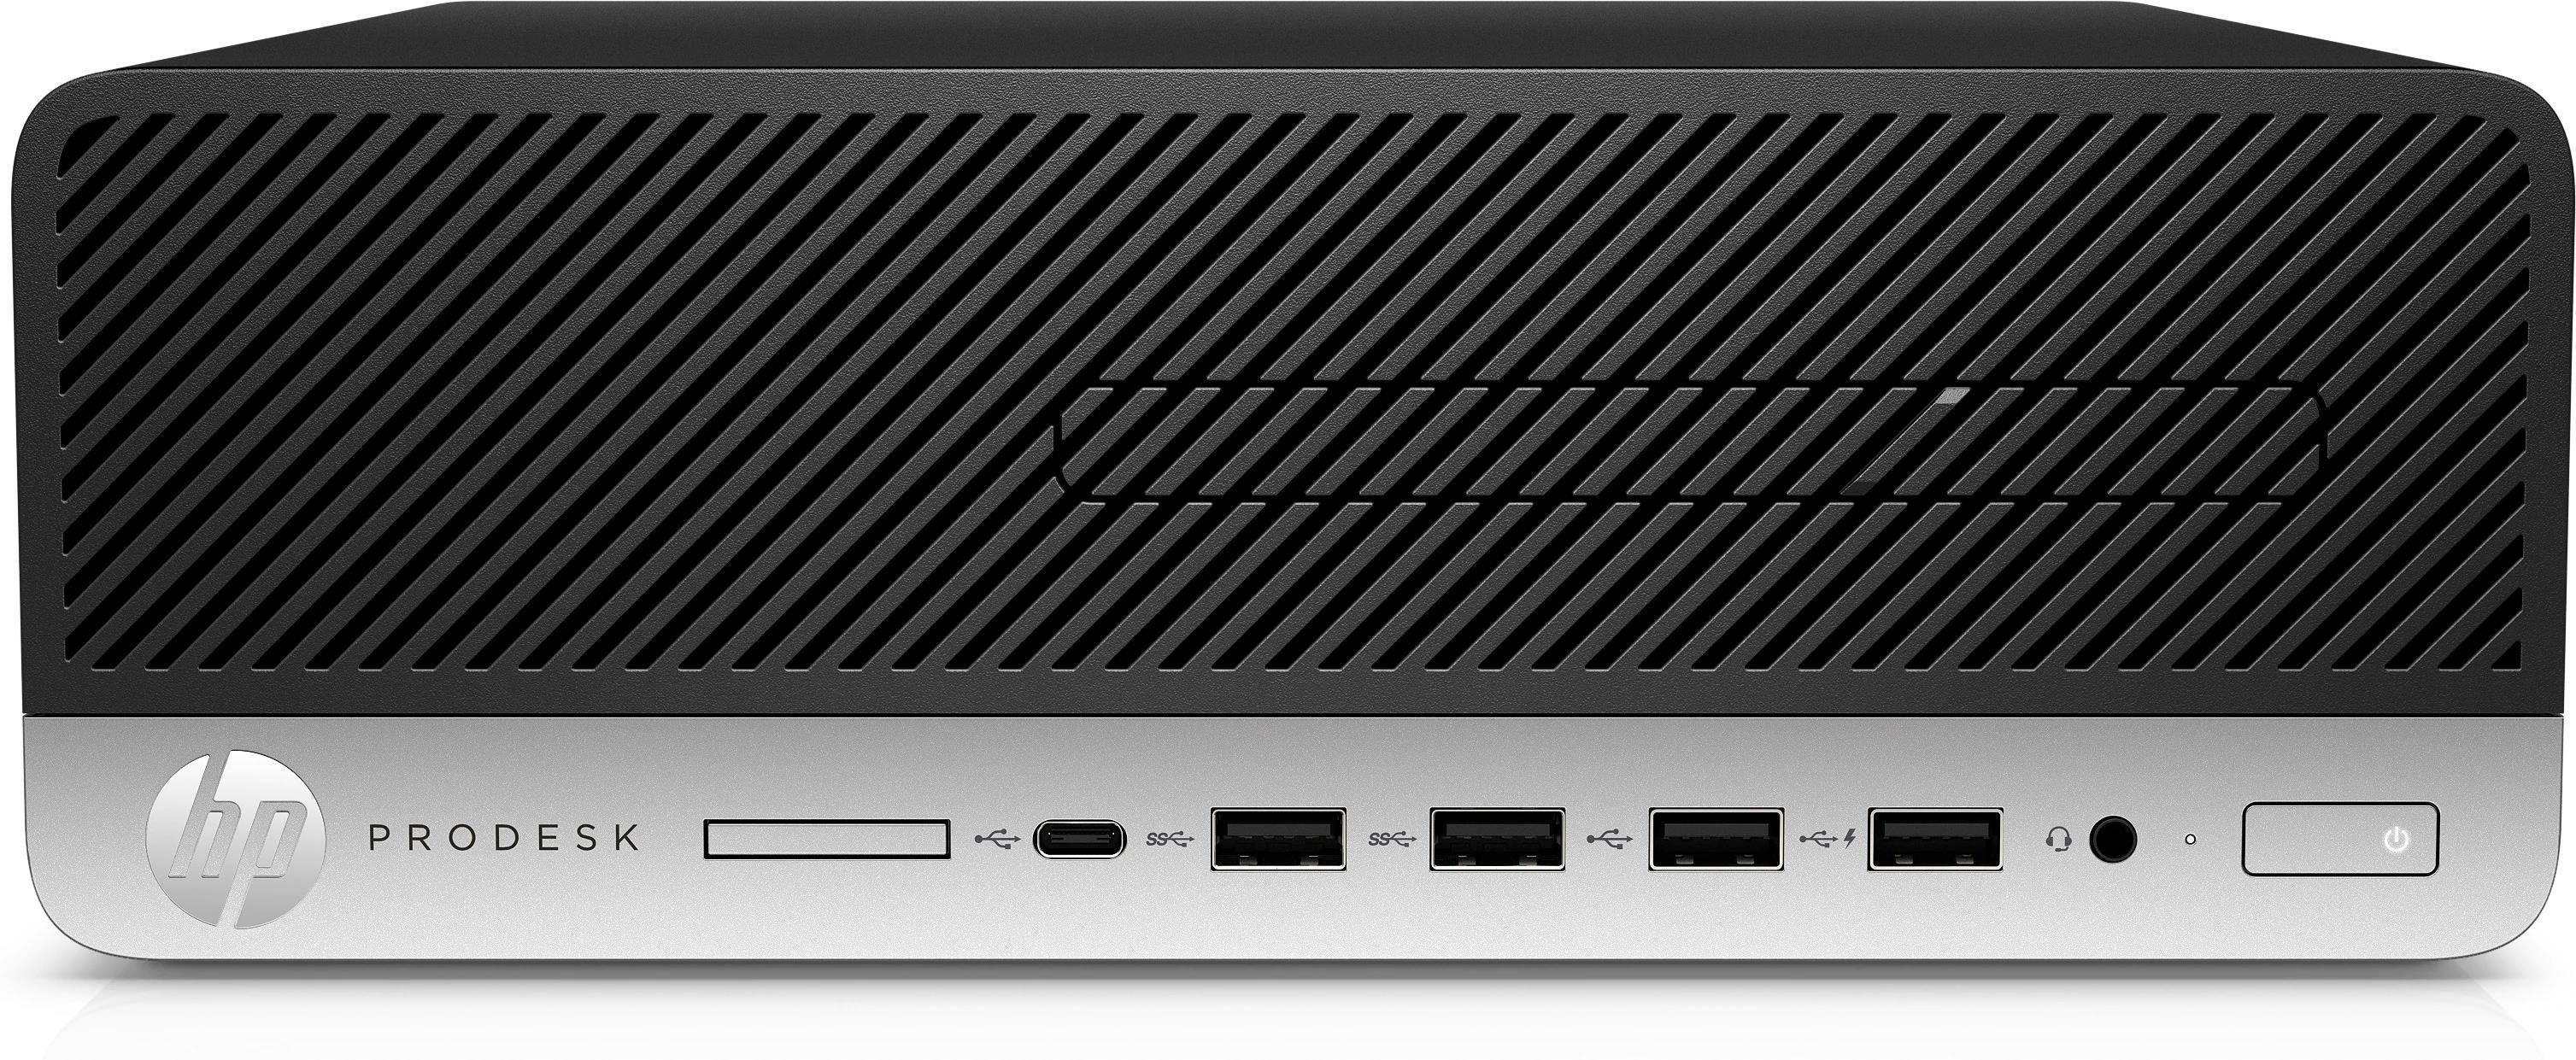 HP ProDesk 600 G5 Small Form Factor PC Core i7 (8700) 3.2GHz 8GB 256GB SSD LAN Windows 10 Pro (UHD Graphics 630)